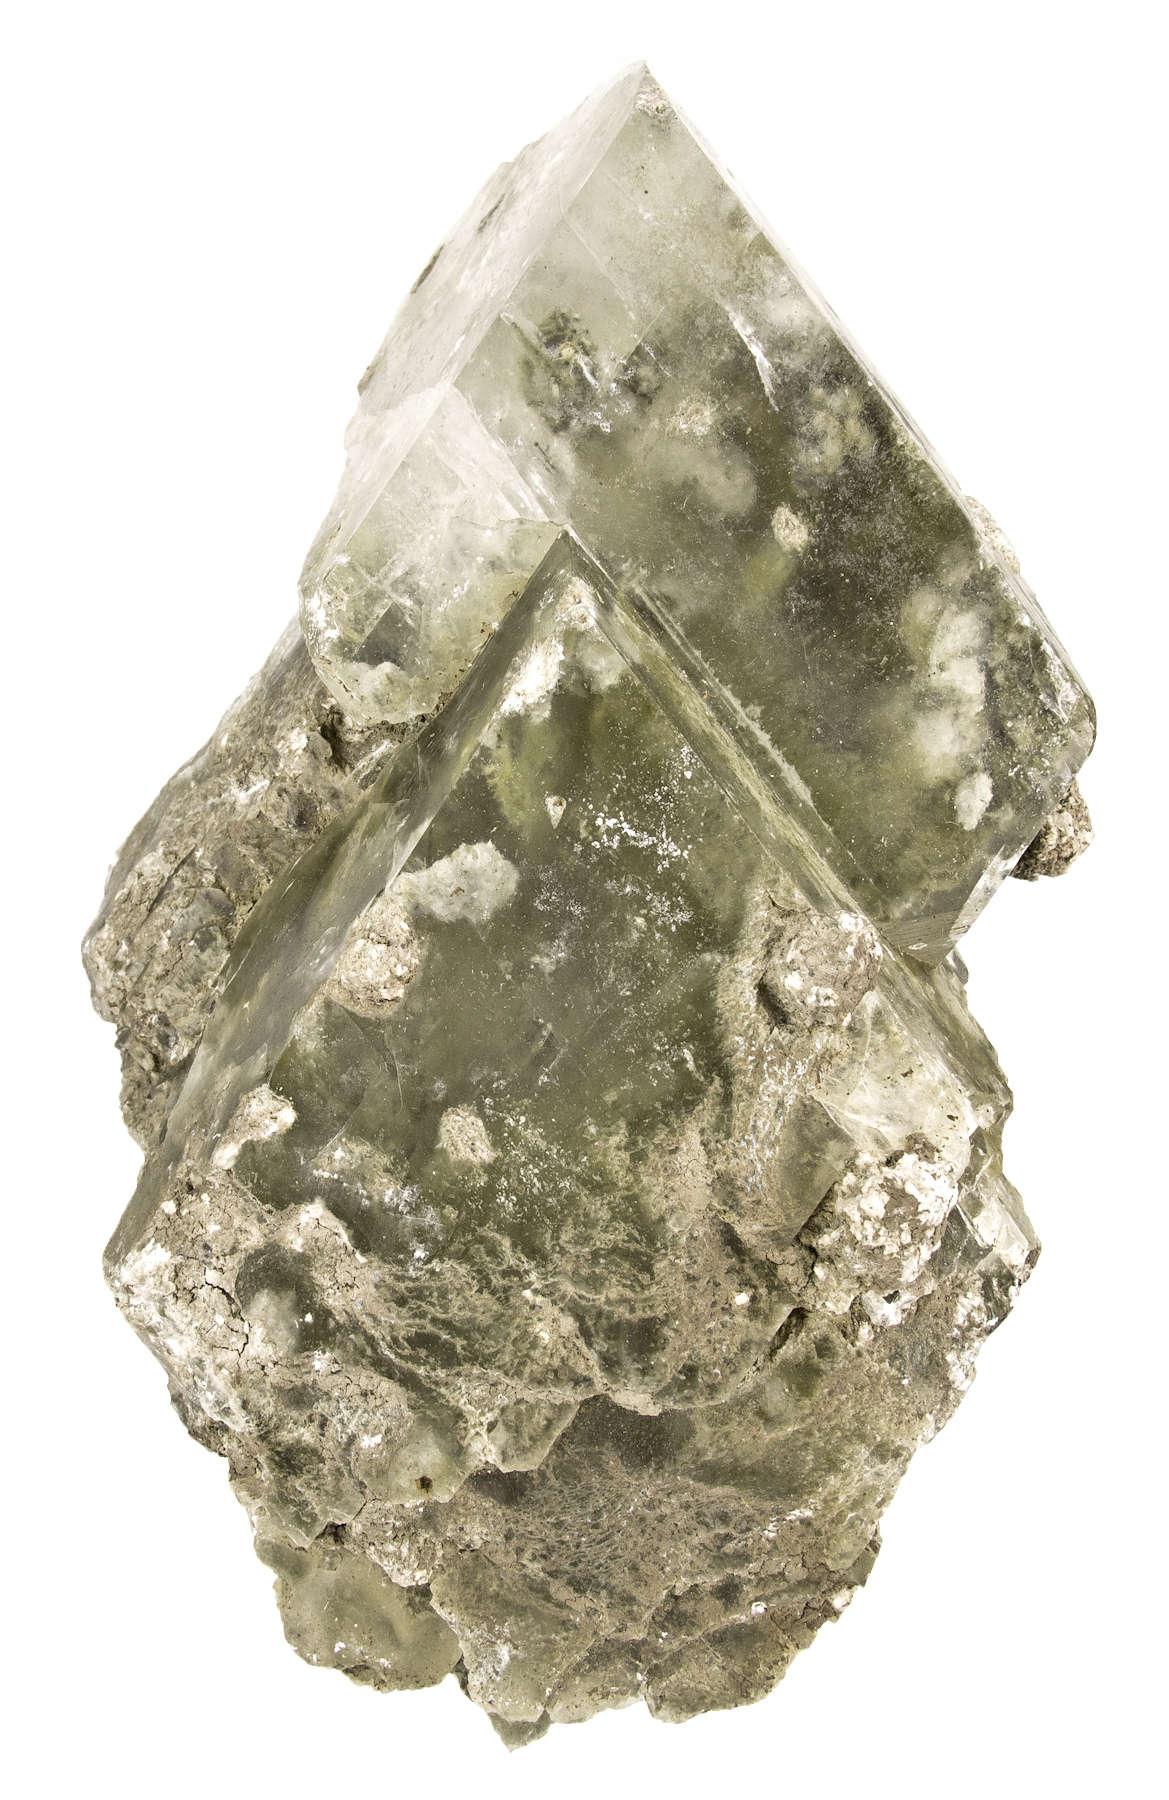 Two large crystals kurnakovite magnesium rich borate emplaced matrix